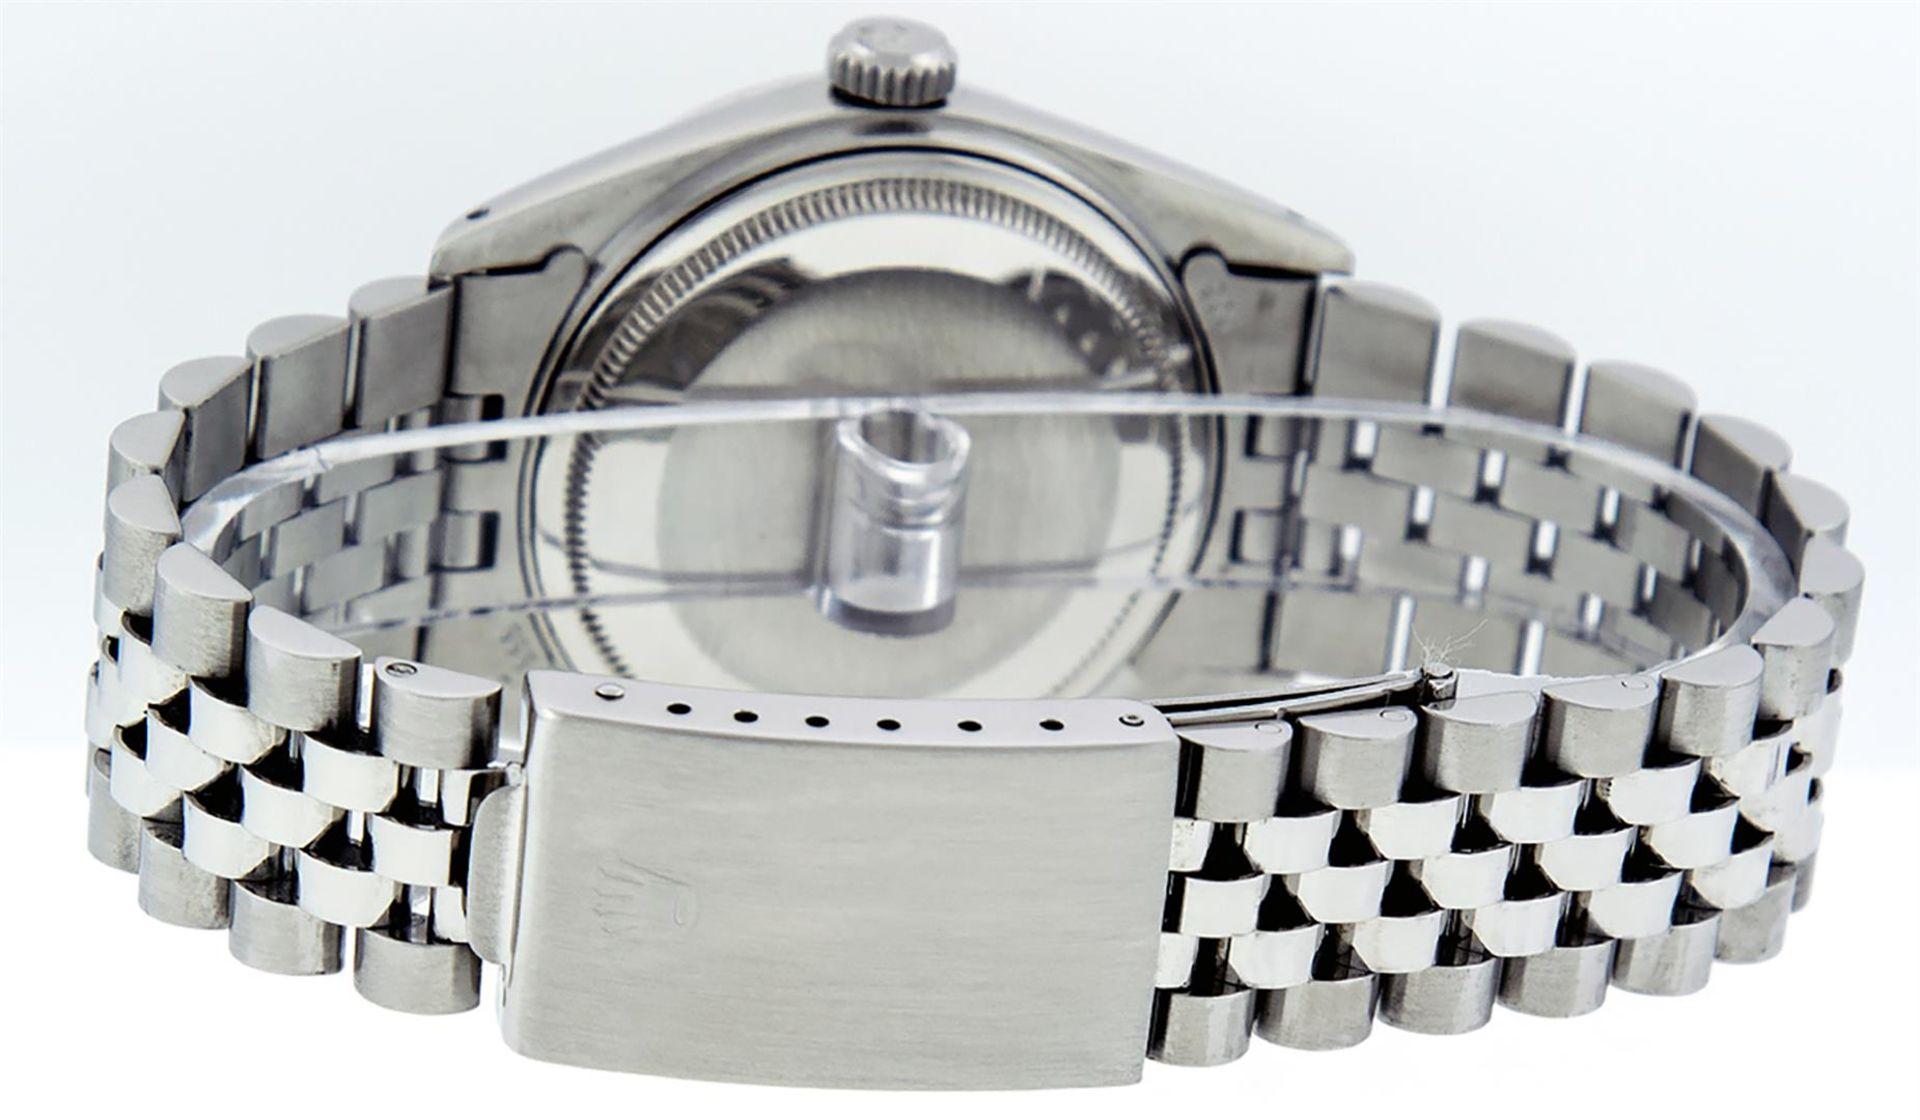 Rolex Mens Stainless Steel Diamond Lugs & Ruby Datejust Wristwatch - Image 5 of 8